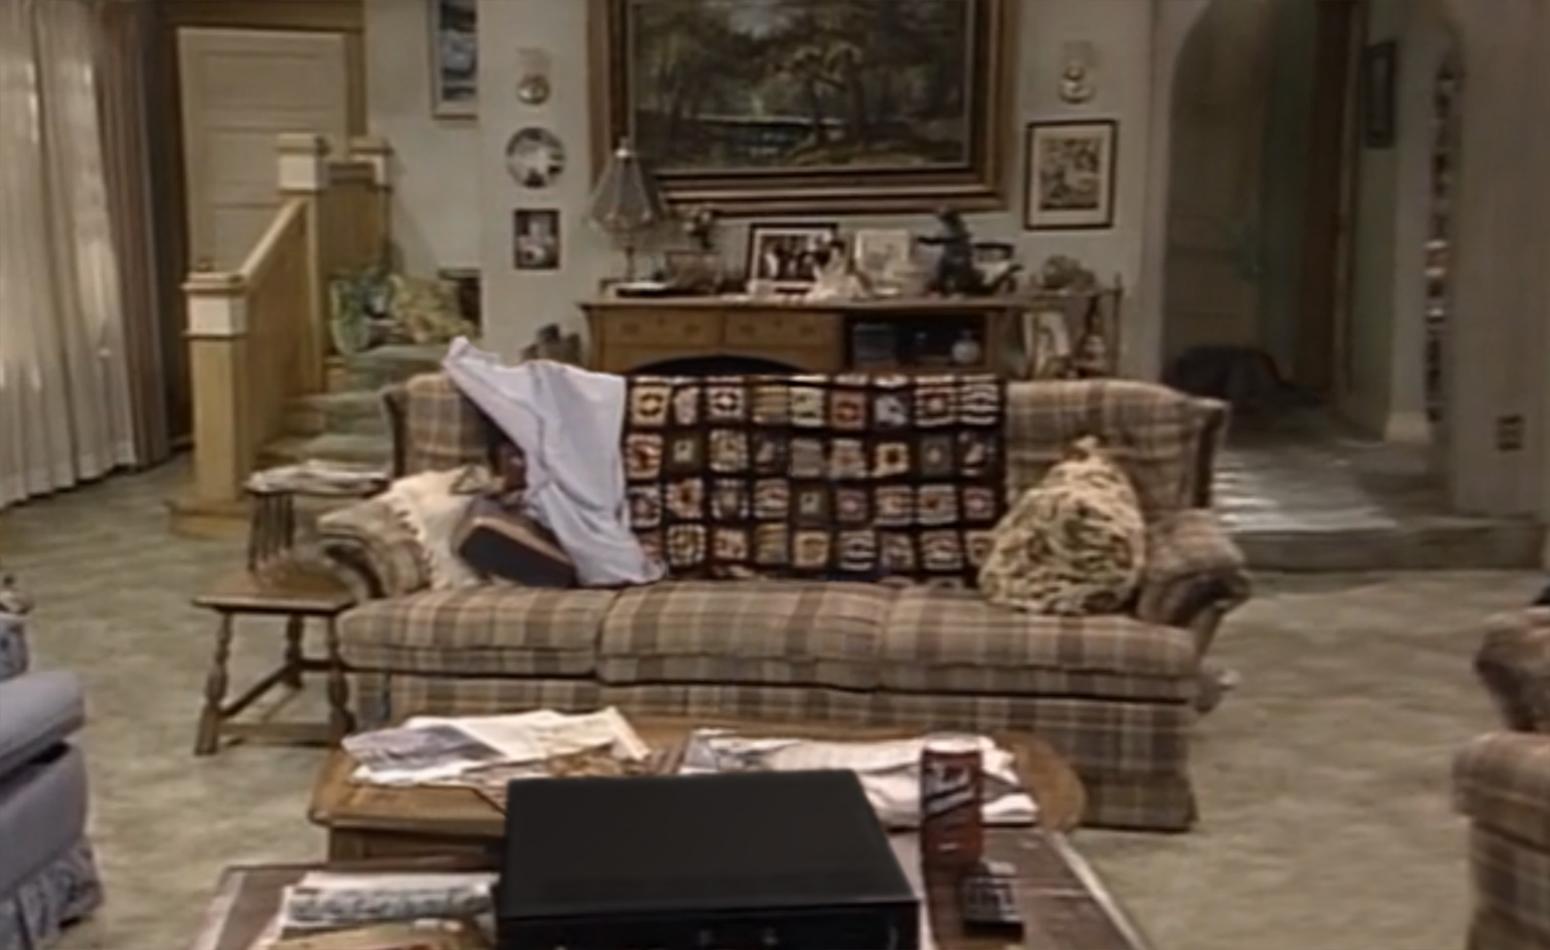 Dekora Home Staging Mid Century Modern Brady Bunch Living Room - Living room shows